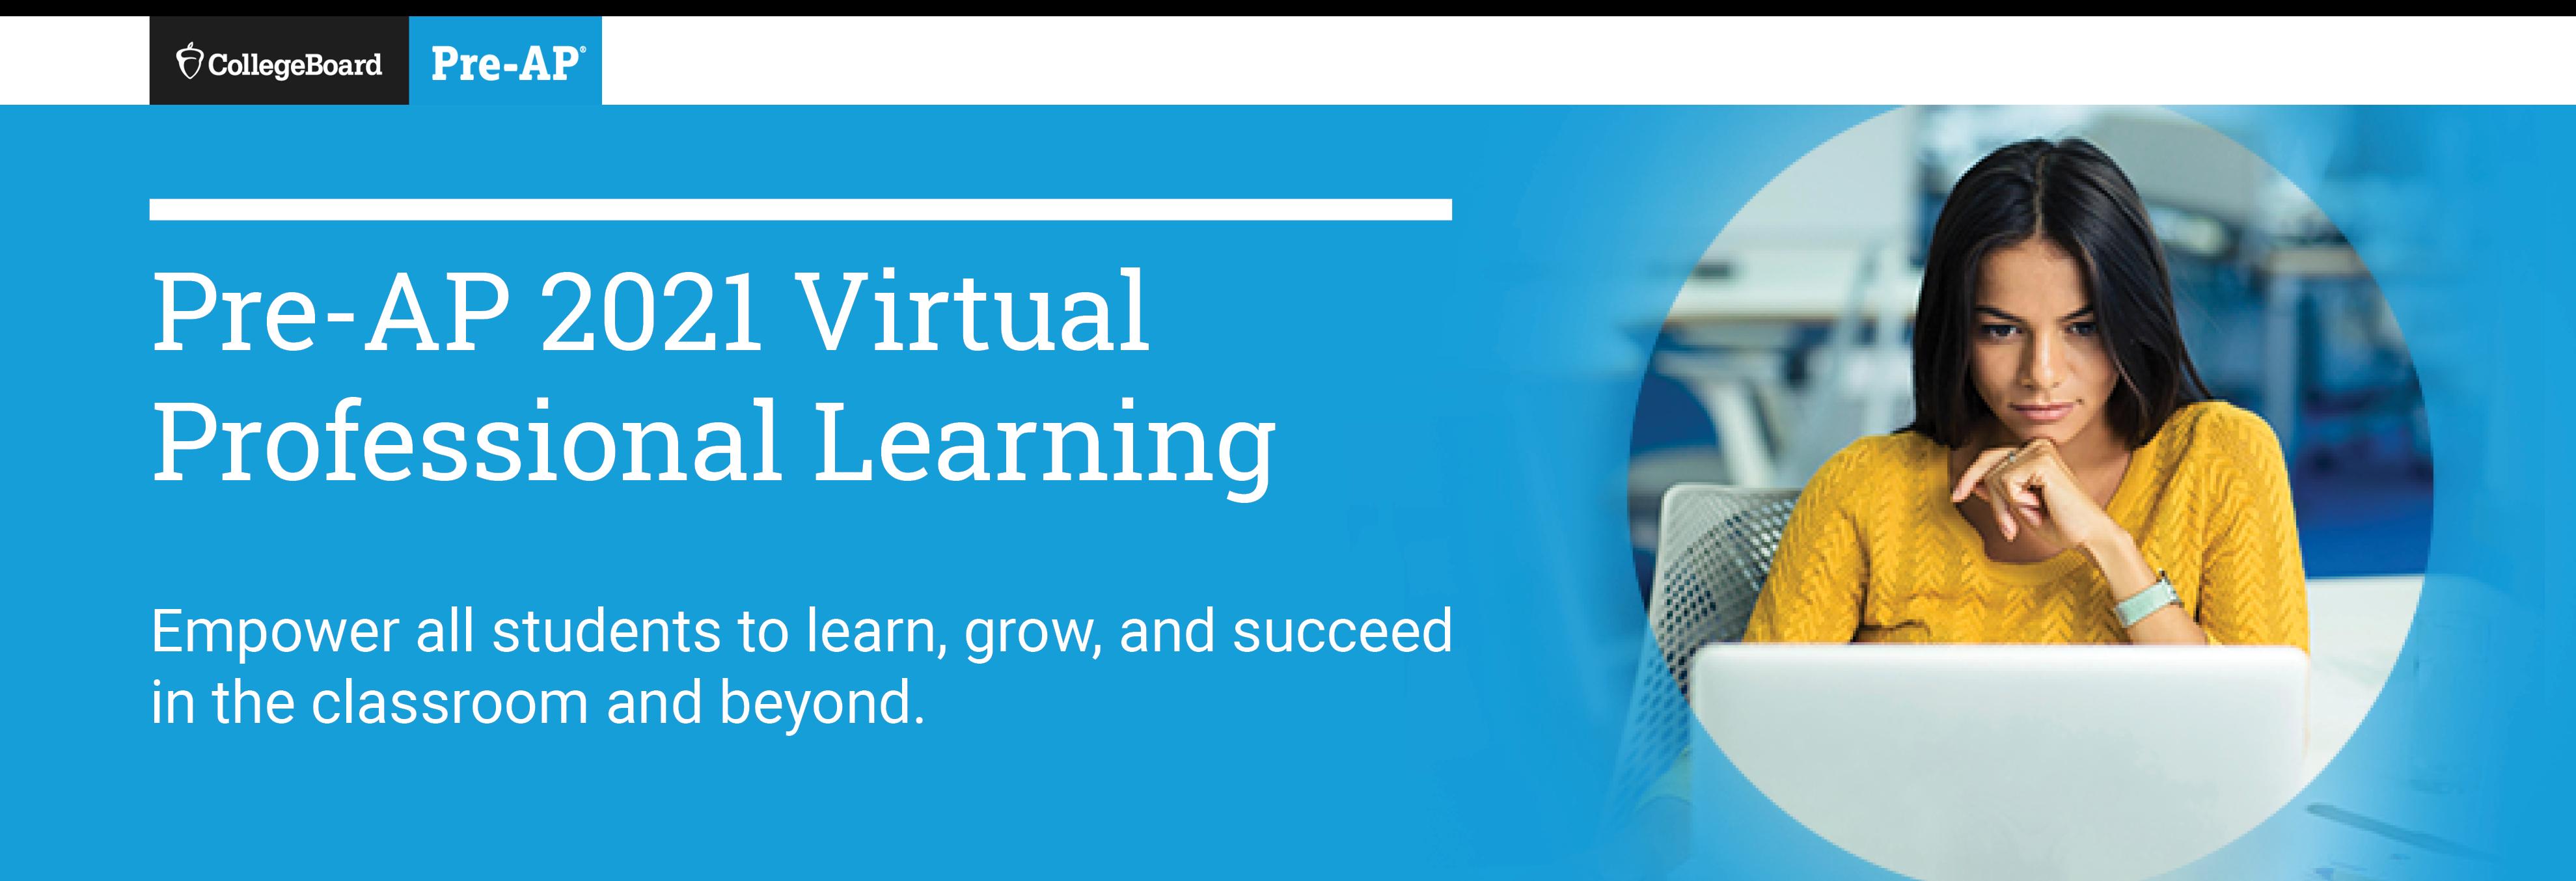 Pre-AP Virtual New Leader Lounge 2021